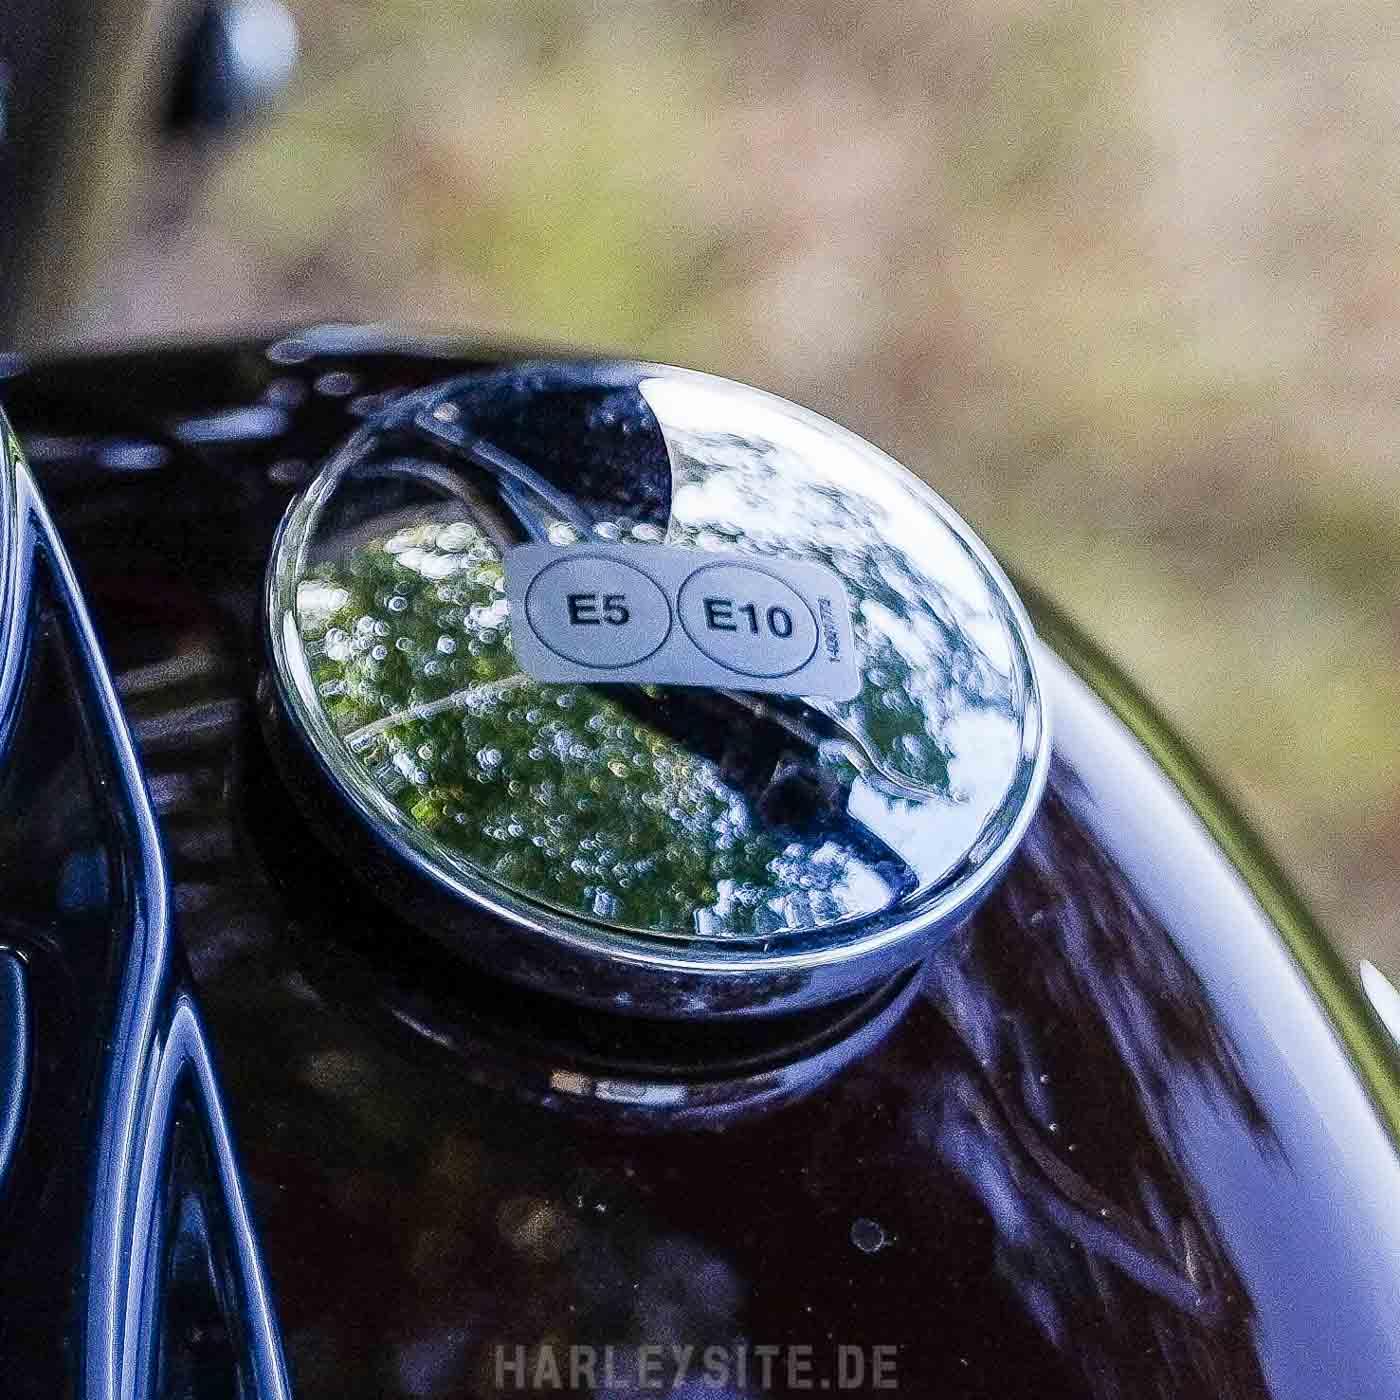 1-Harley-Davidson Heritage Classic 114 2019-A7301420